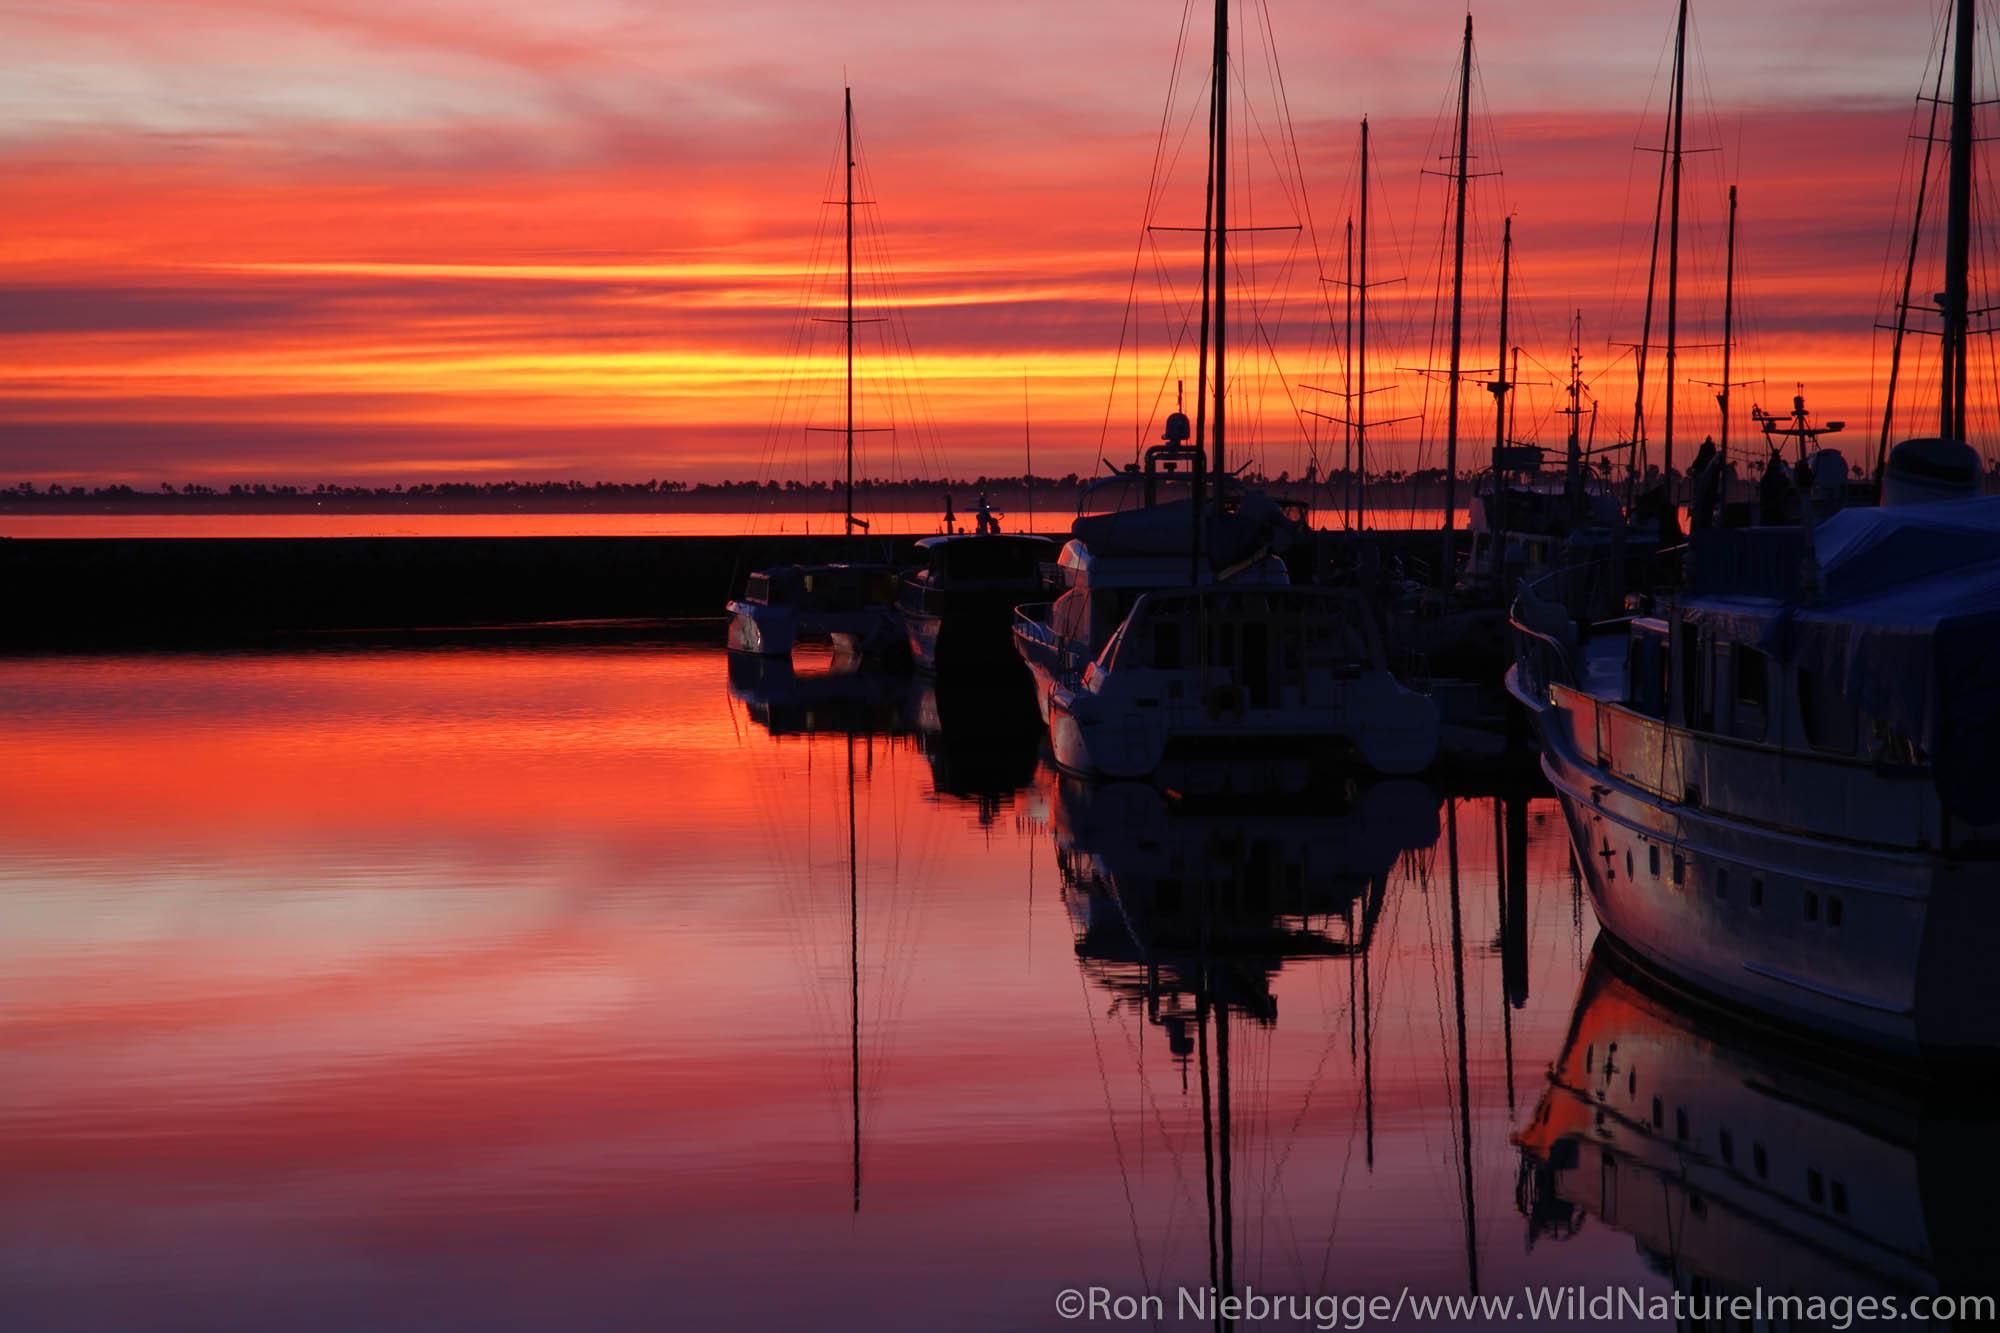 The Chula Vista Marina at sunset, Chula Vista, California.